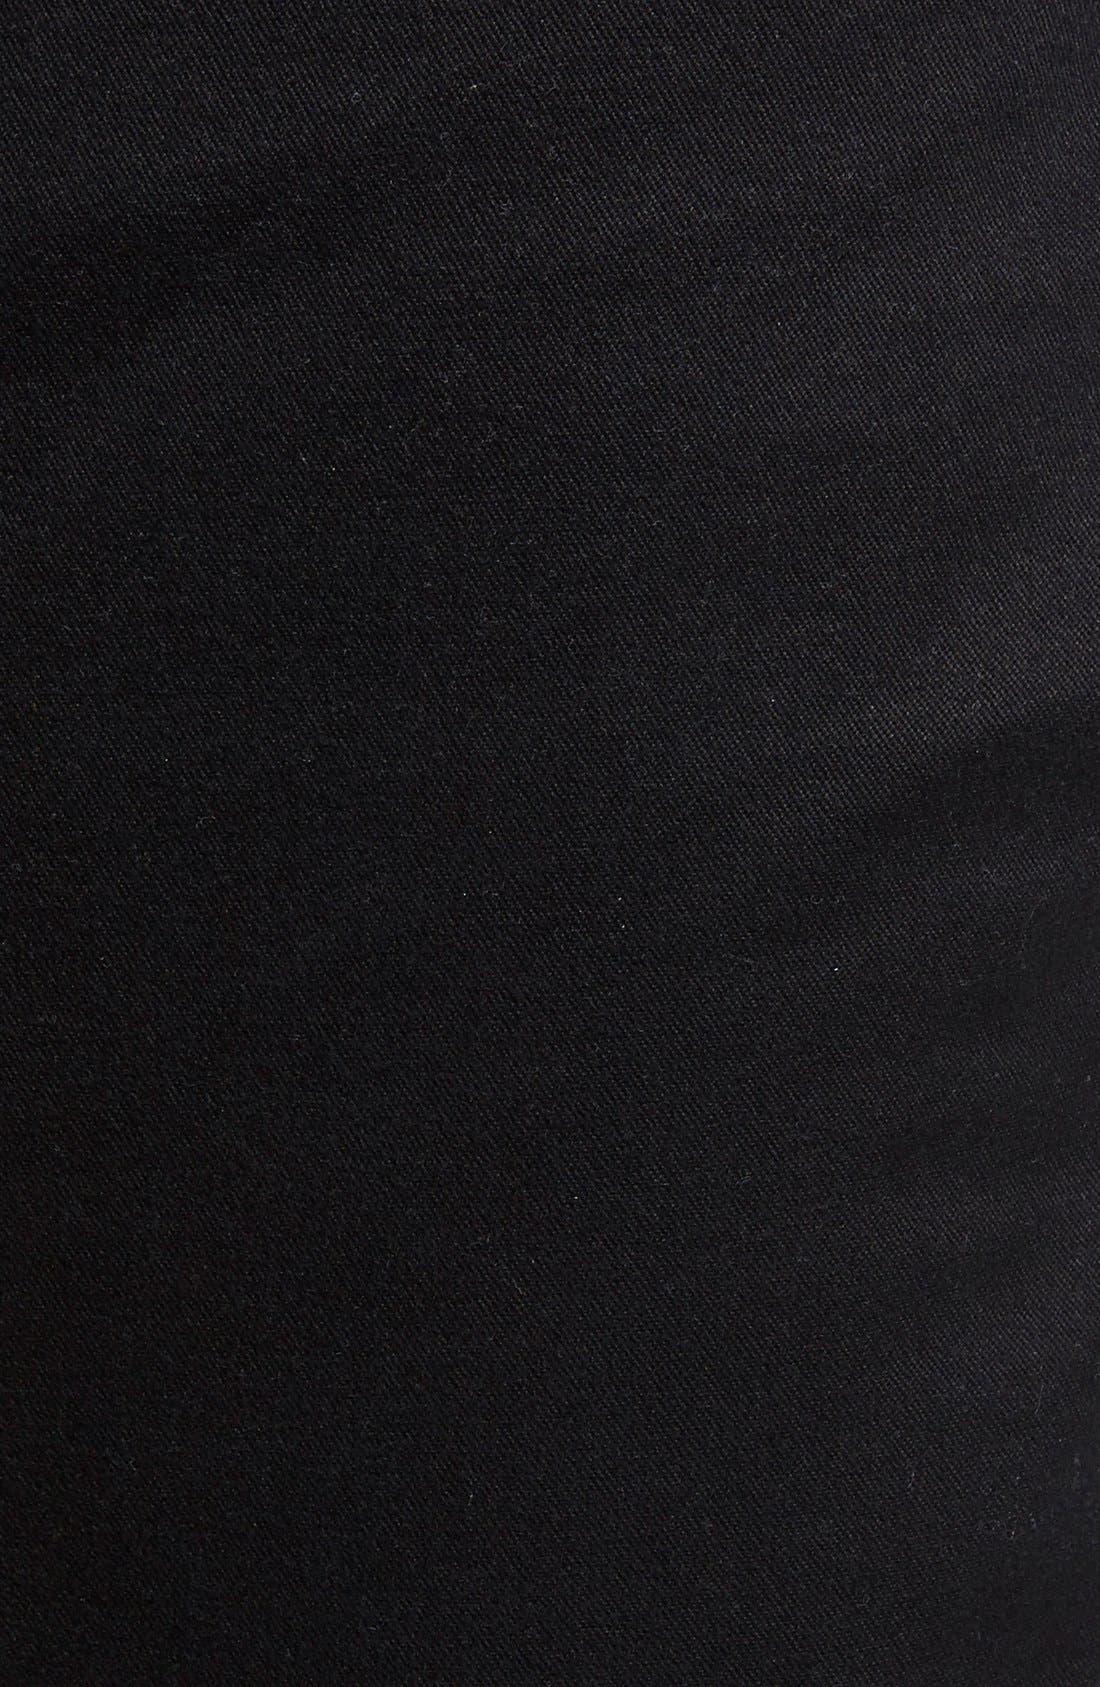 Salerno Stretch Woven Jogger Pants,                             Alternate thumbnail 5, color,                             BLACK